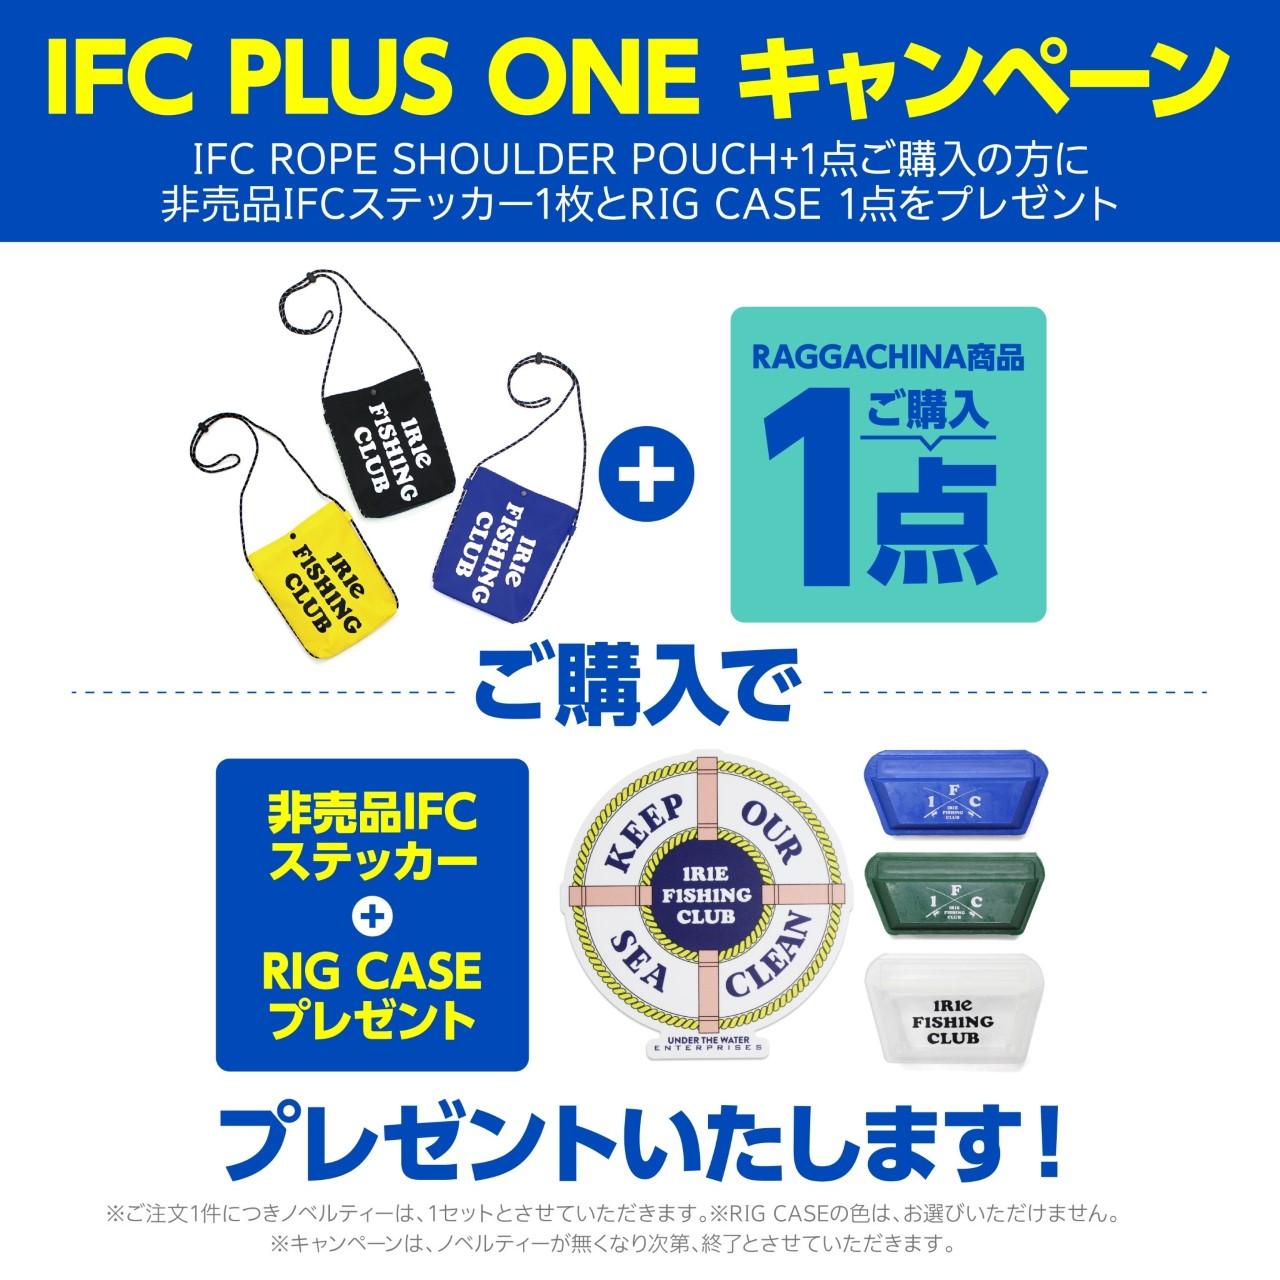 IFC PLUS ONE★キャンペーン